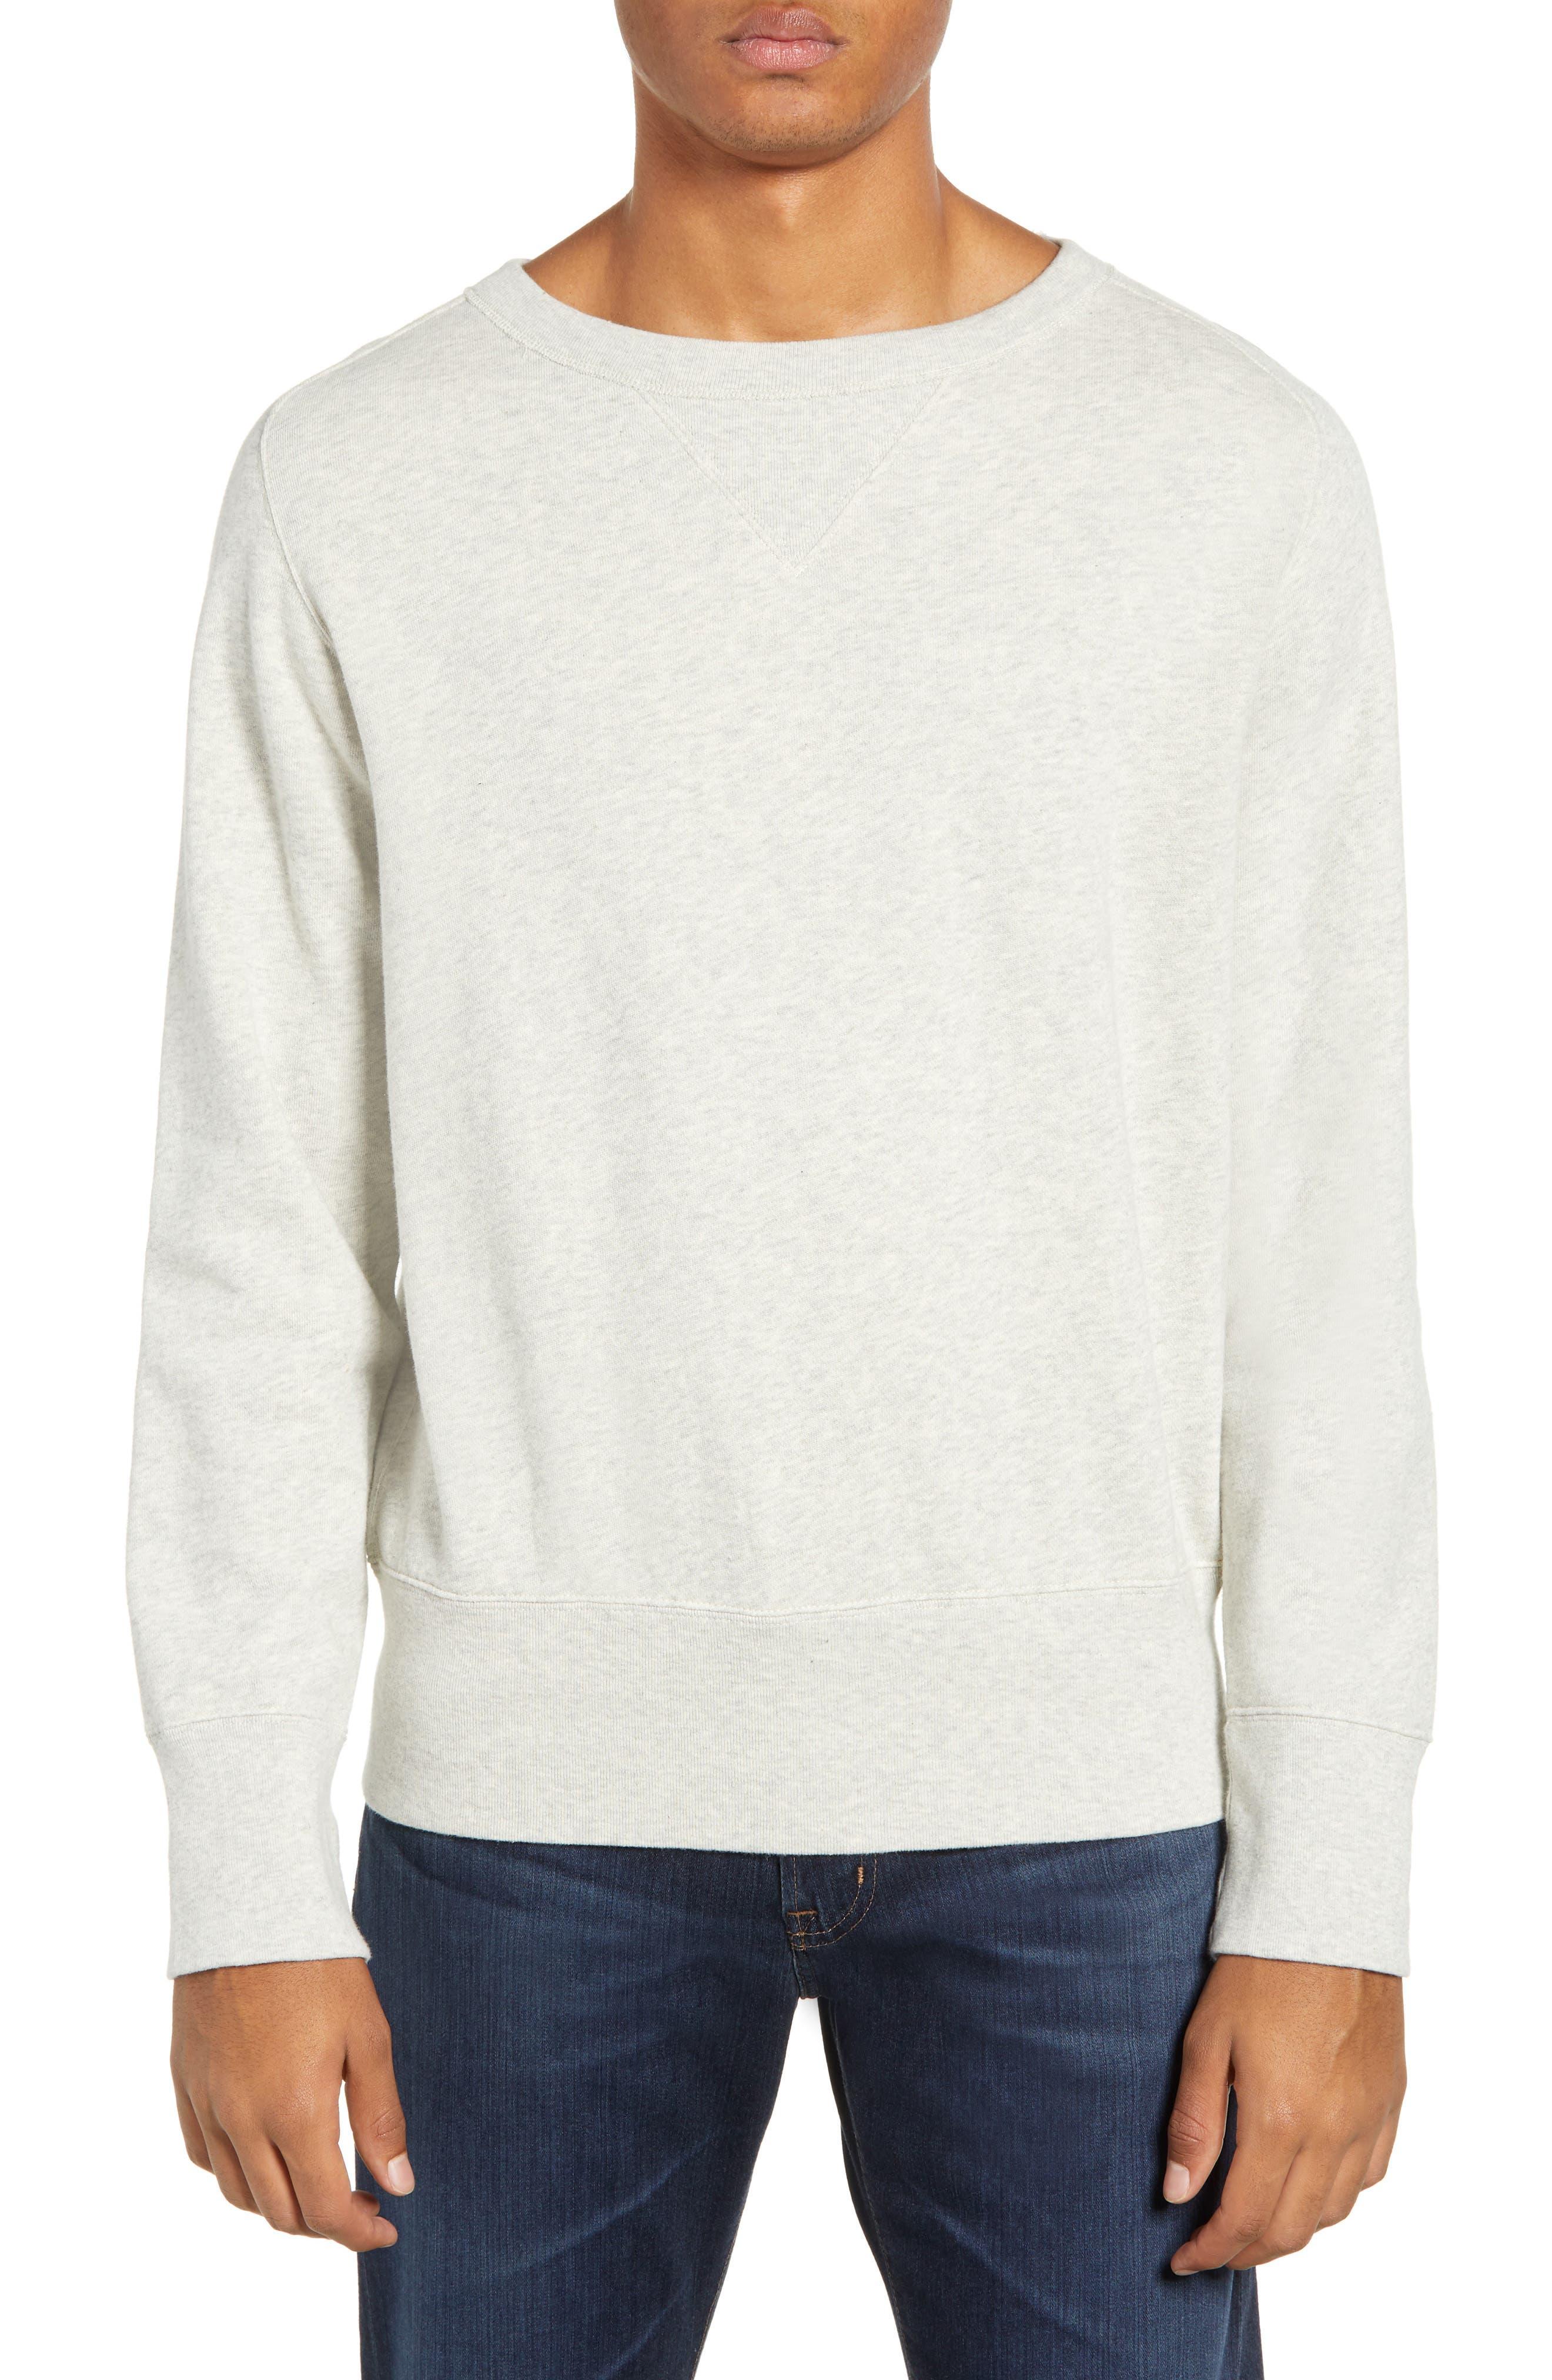 LEVI'S<SUP>®</SUP> VINTAGE CLOTHING, 1930s Bay Meadows Sweatshirt, Main thumbnail 1, color, OATMEAL